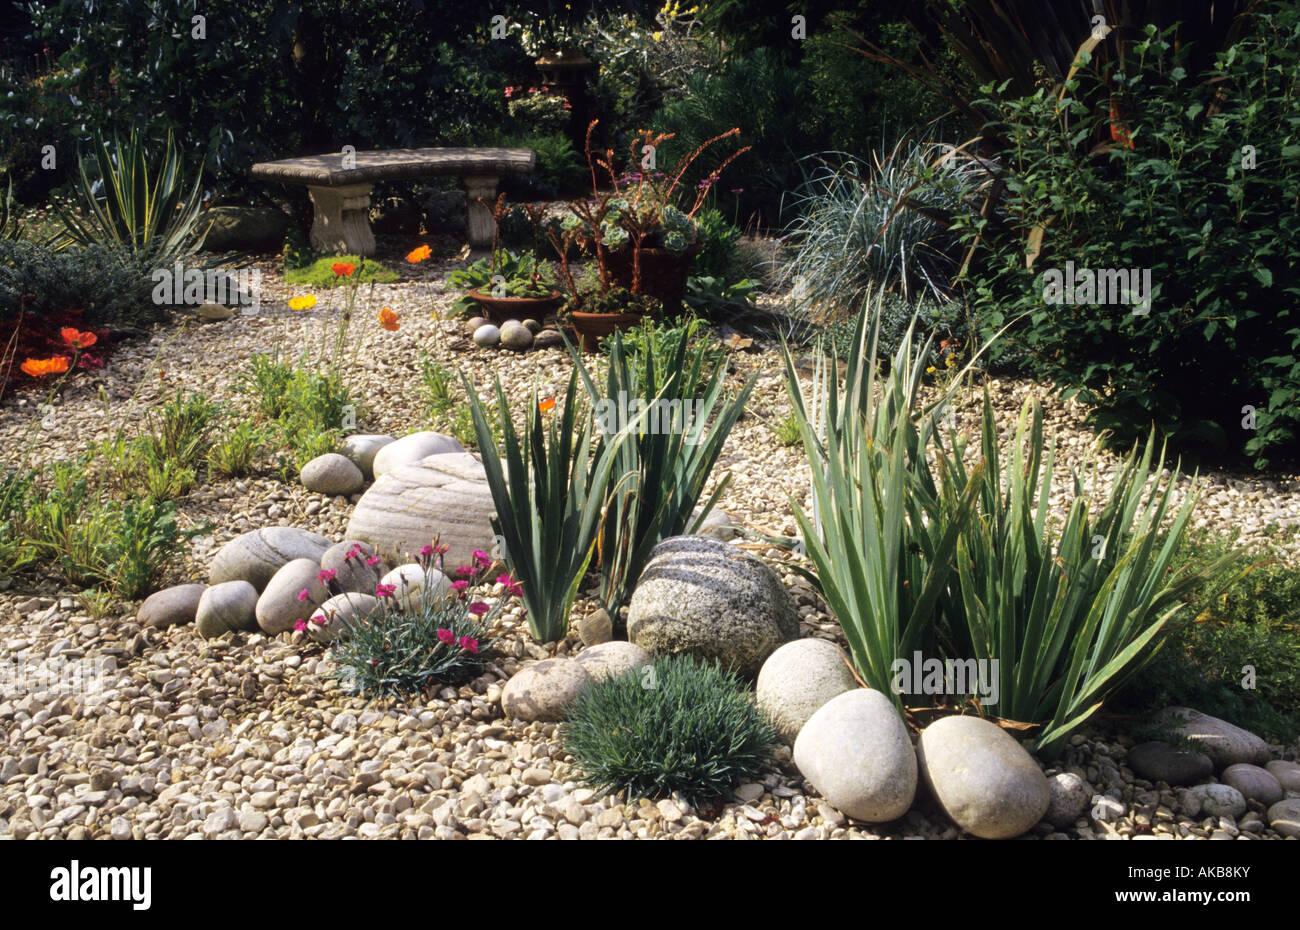 Heathfield Surrey Gravel Garden With Stones Pebbles Phormium ...